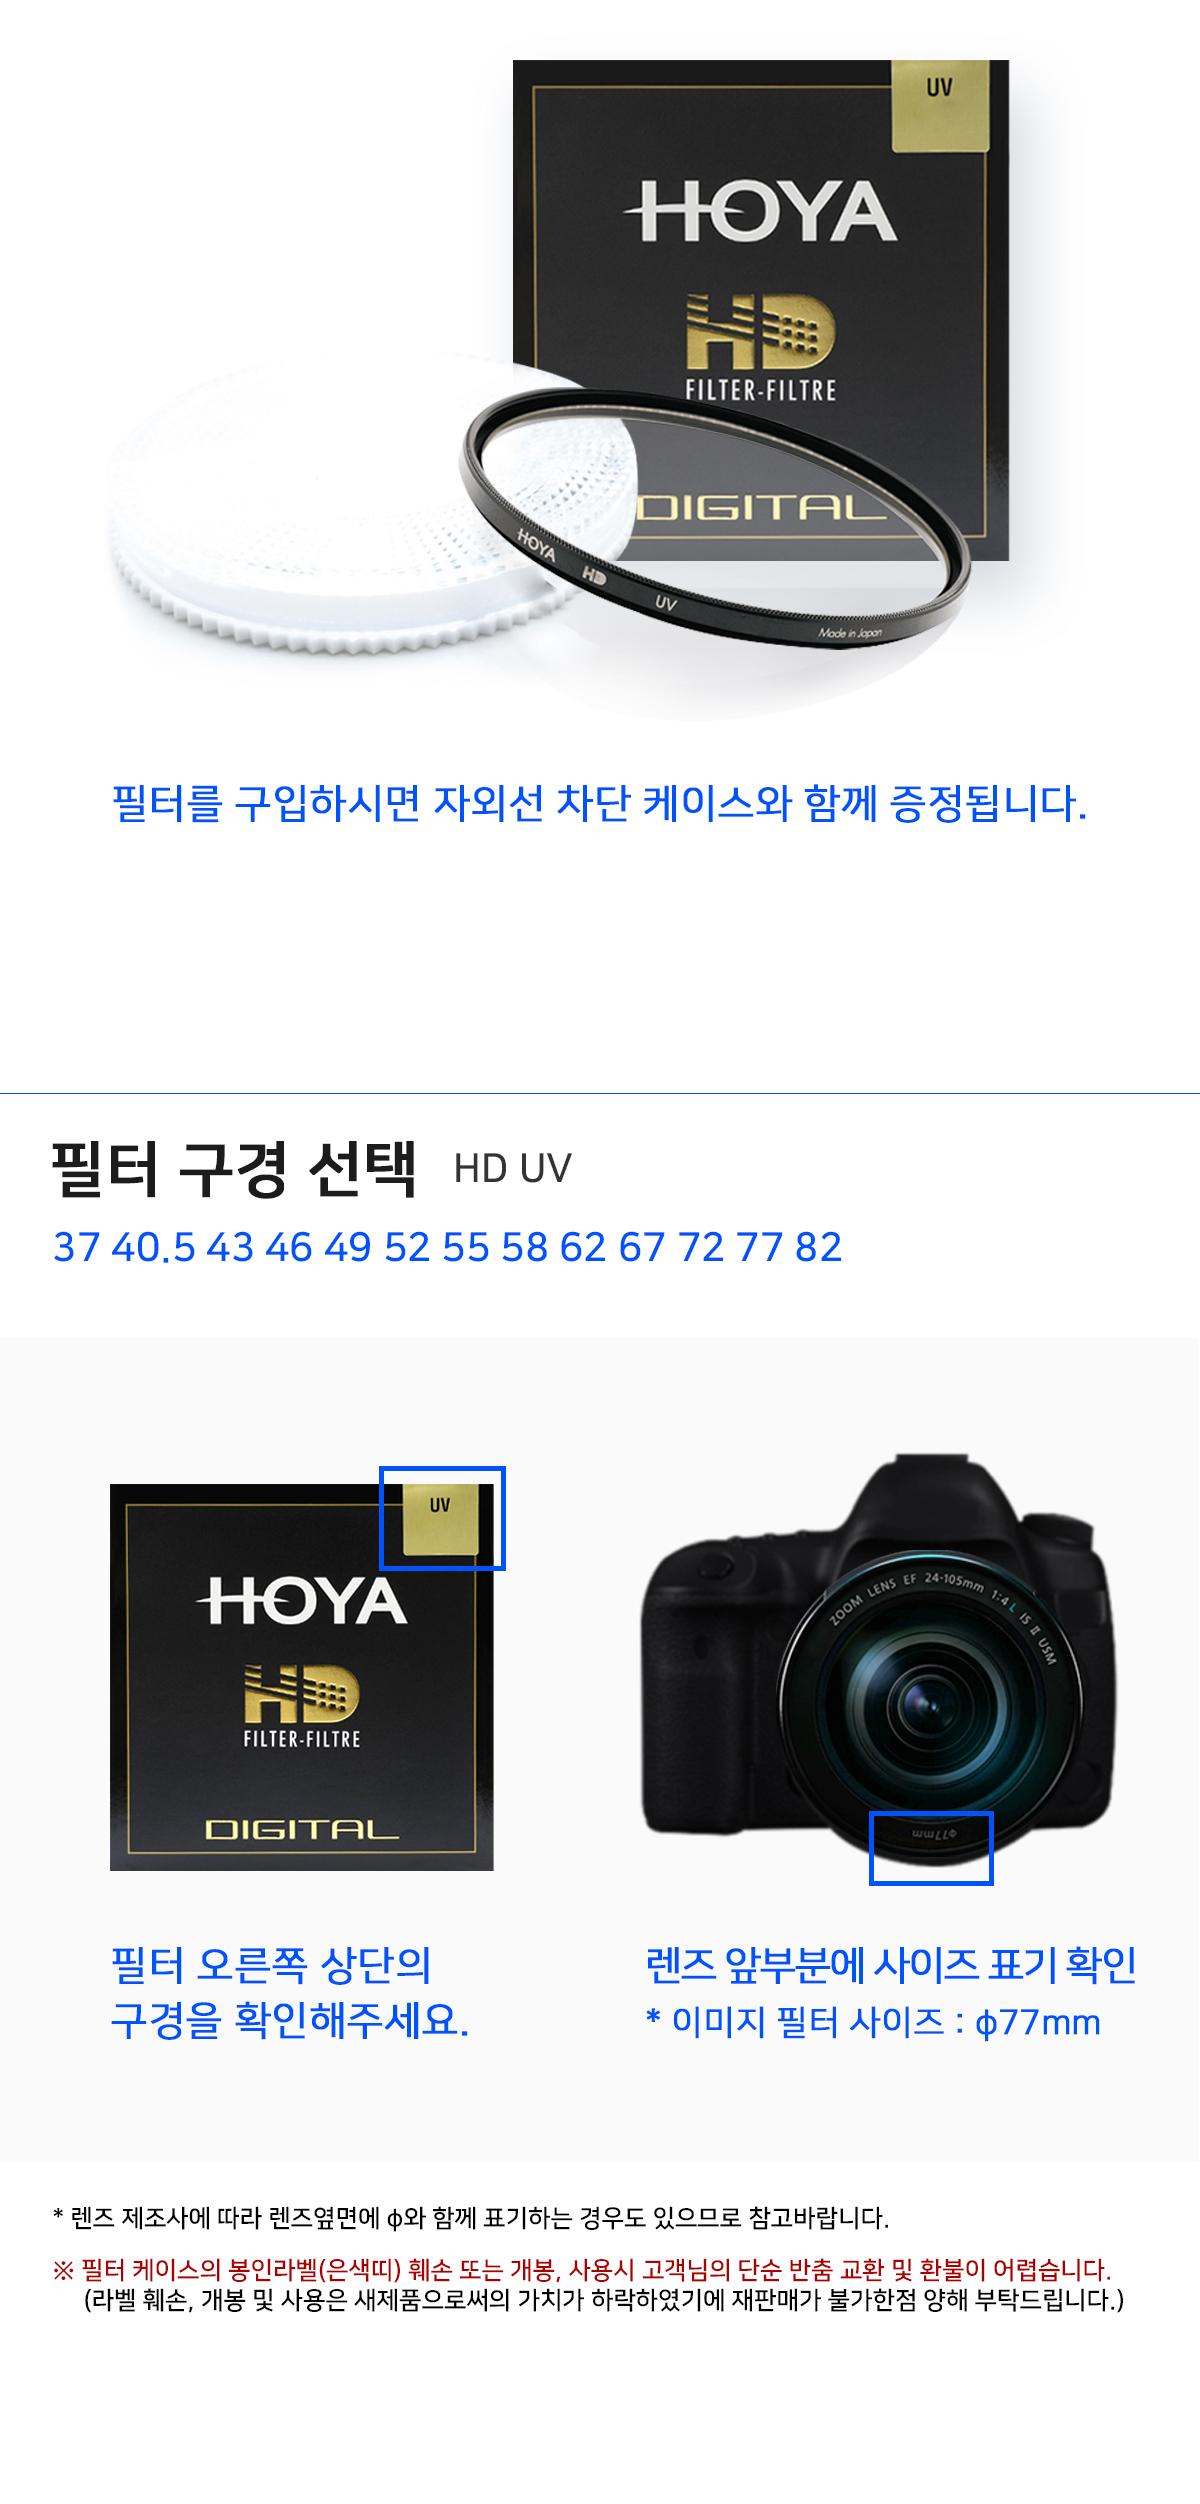 HD_UV_05.jpg